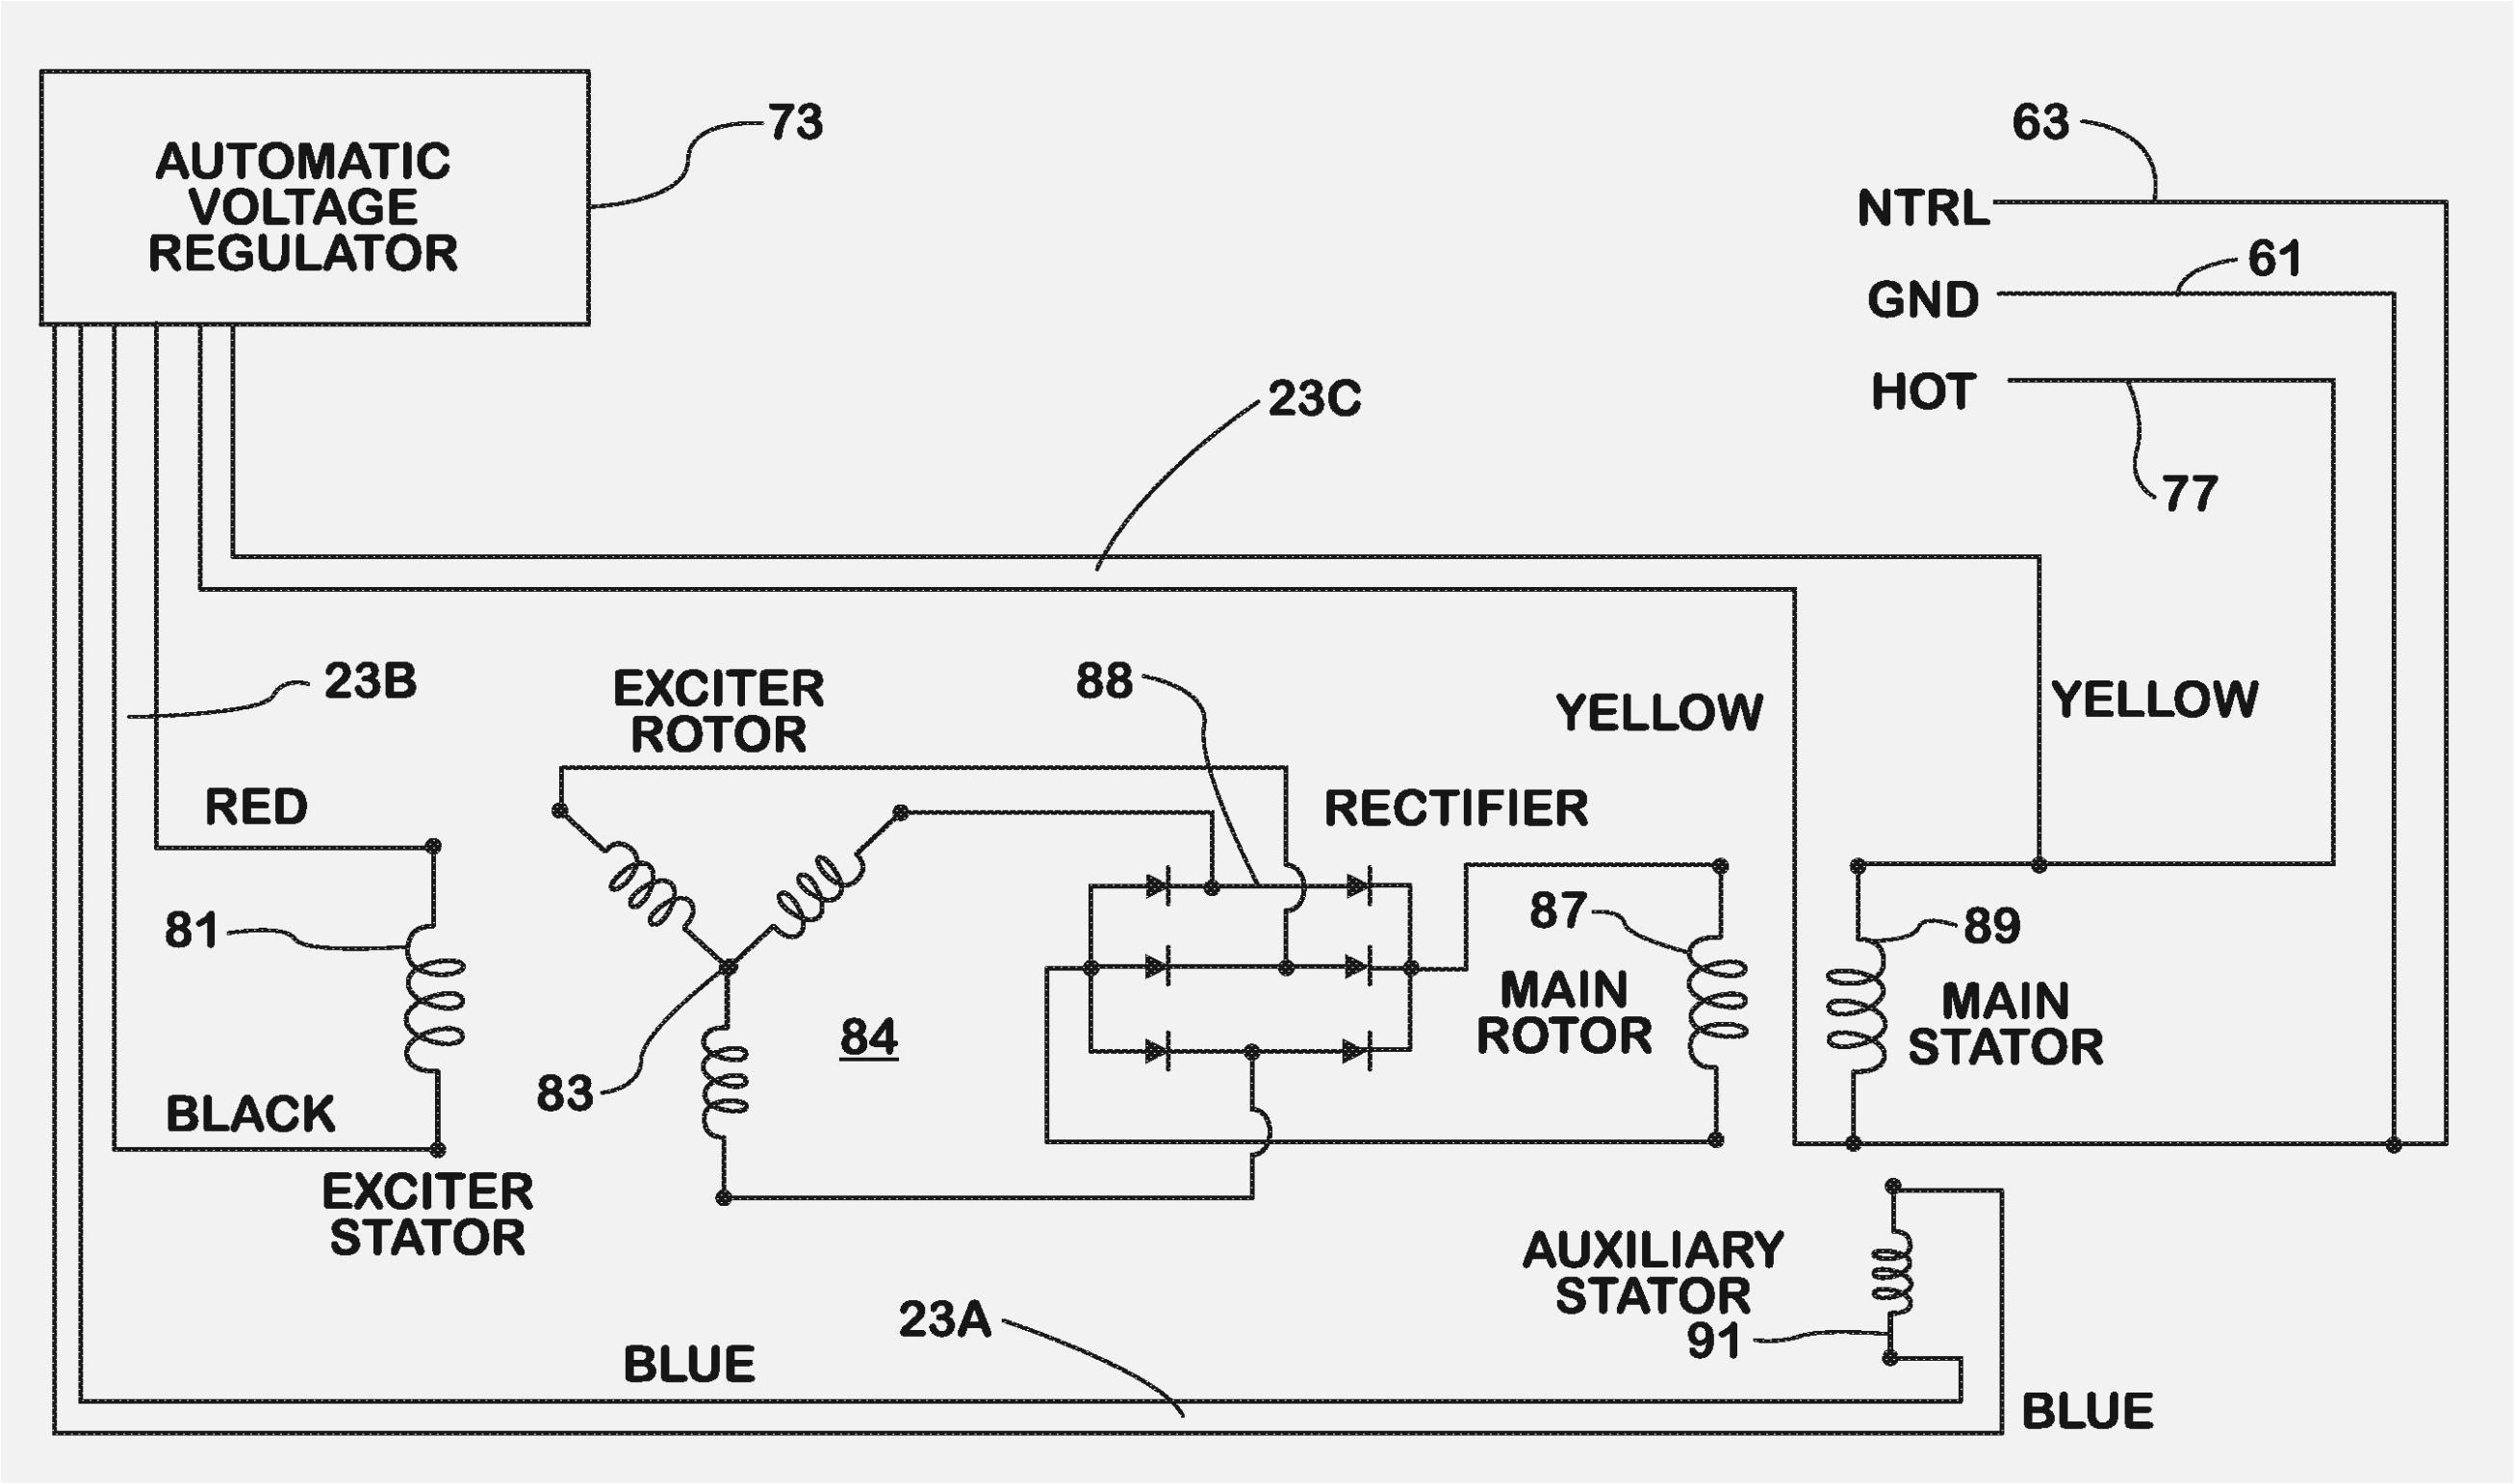 harley voltage regulator wiring diagram wiring diagram perfomancegenerator voltage regulator wiring diagram harley wiring diagram site